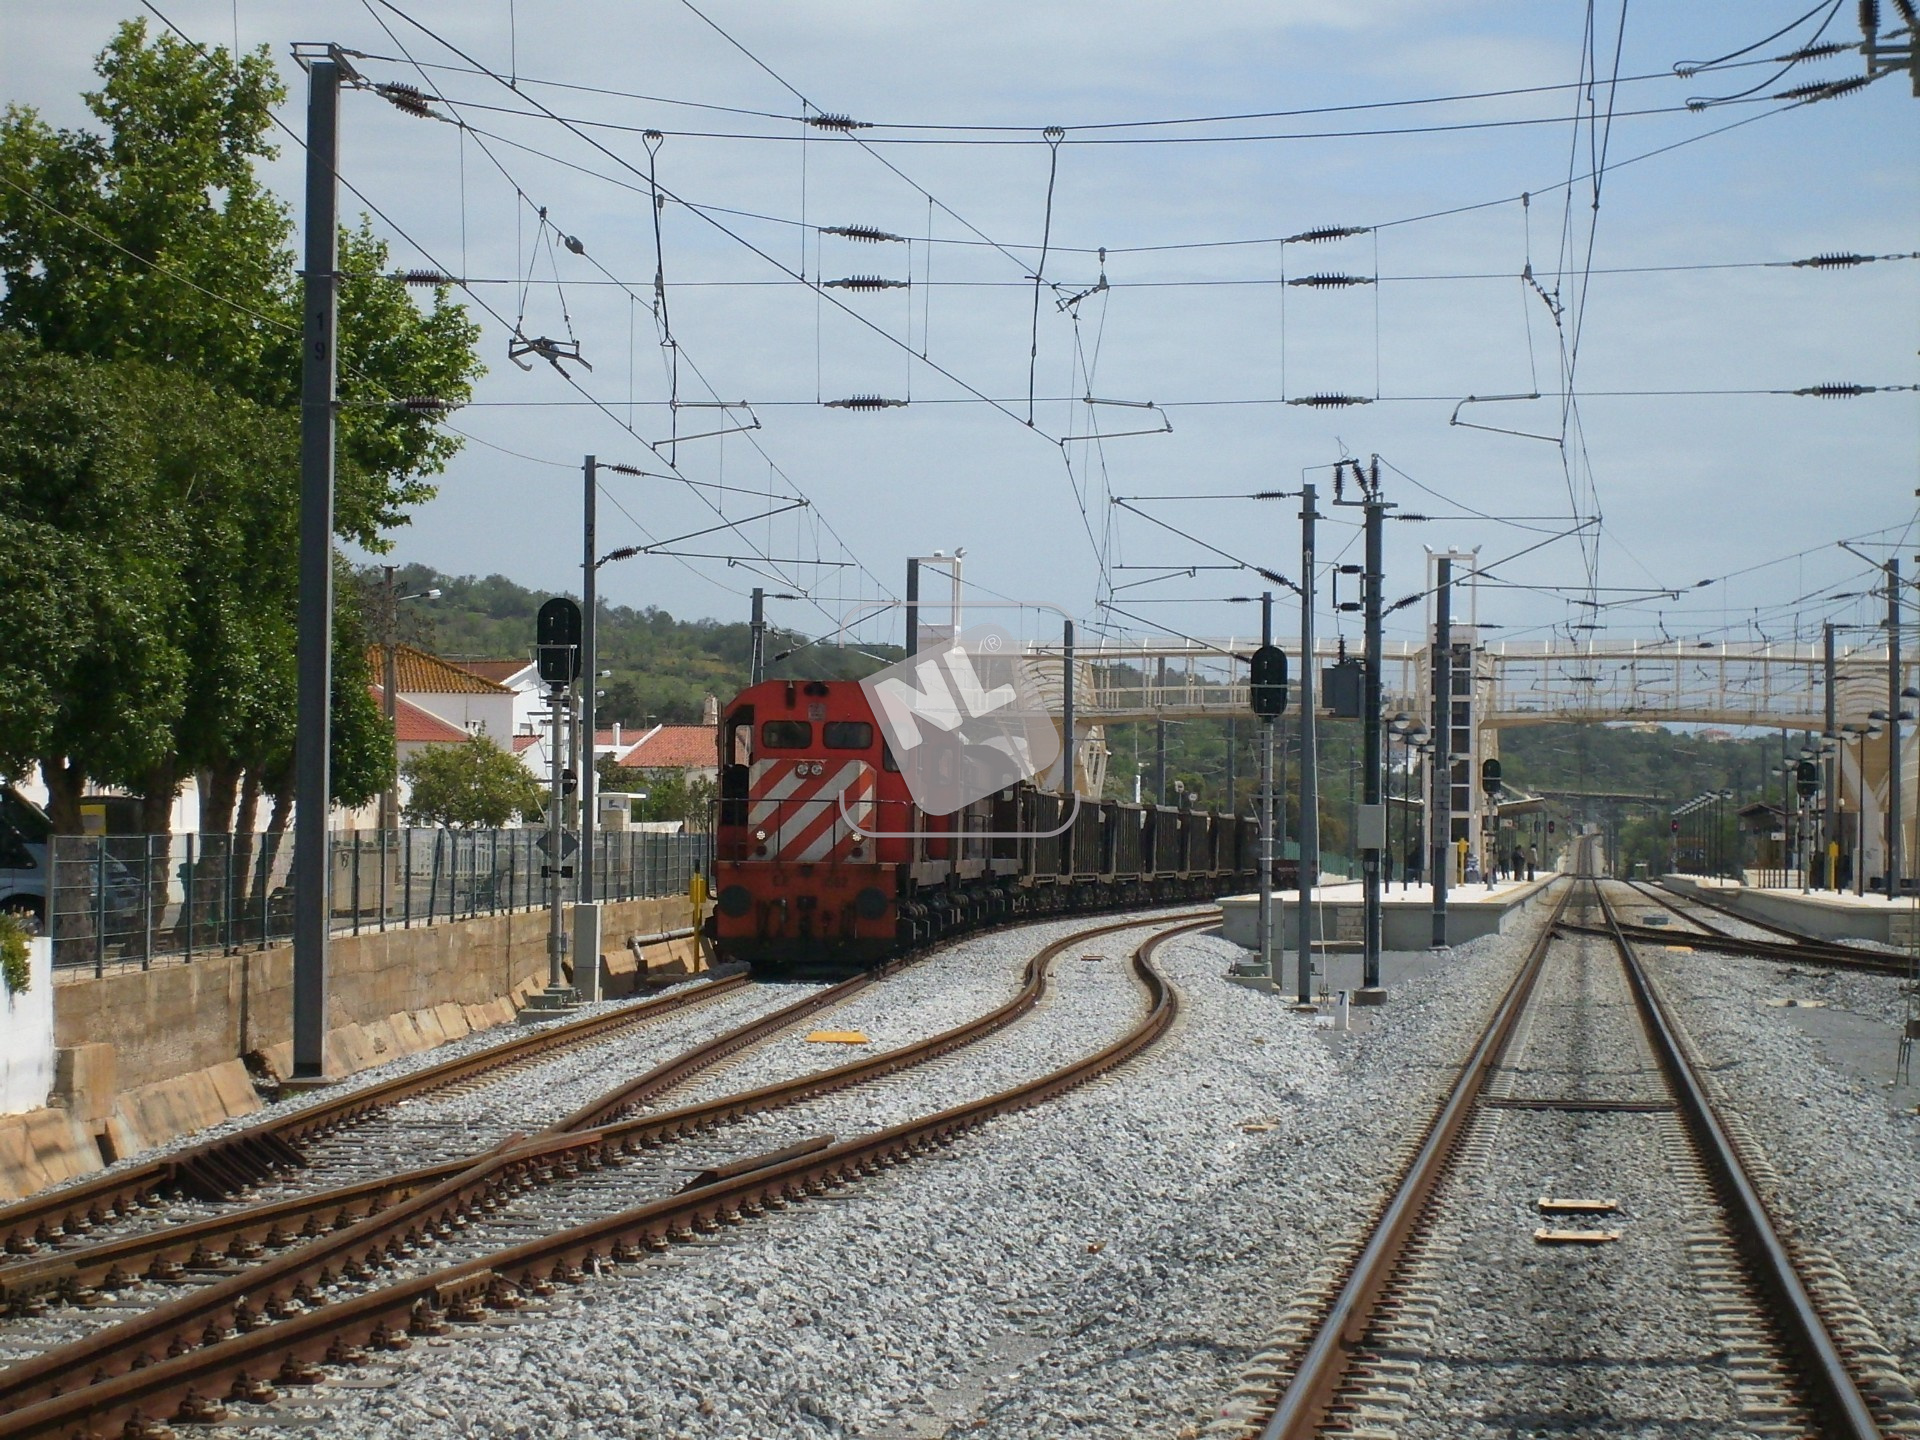 Tunes_Railway_Station